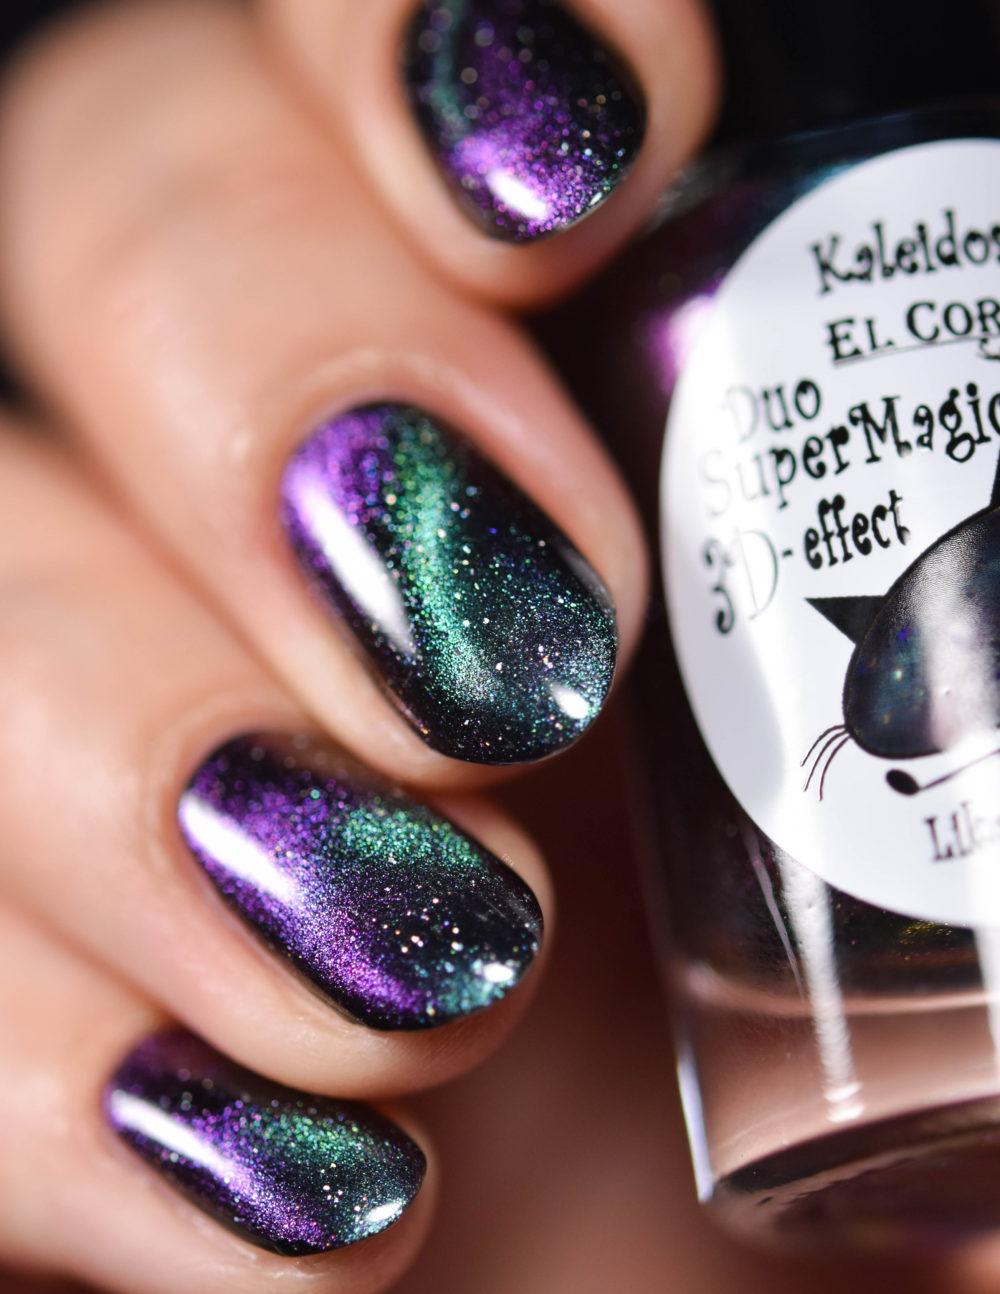 Kaleidoscope_by_ElCorazon-Duo_Super_Magic_Cats_n°82-5